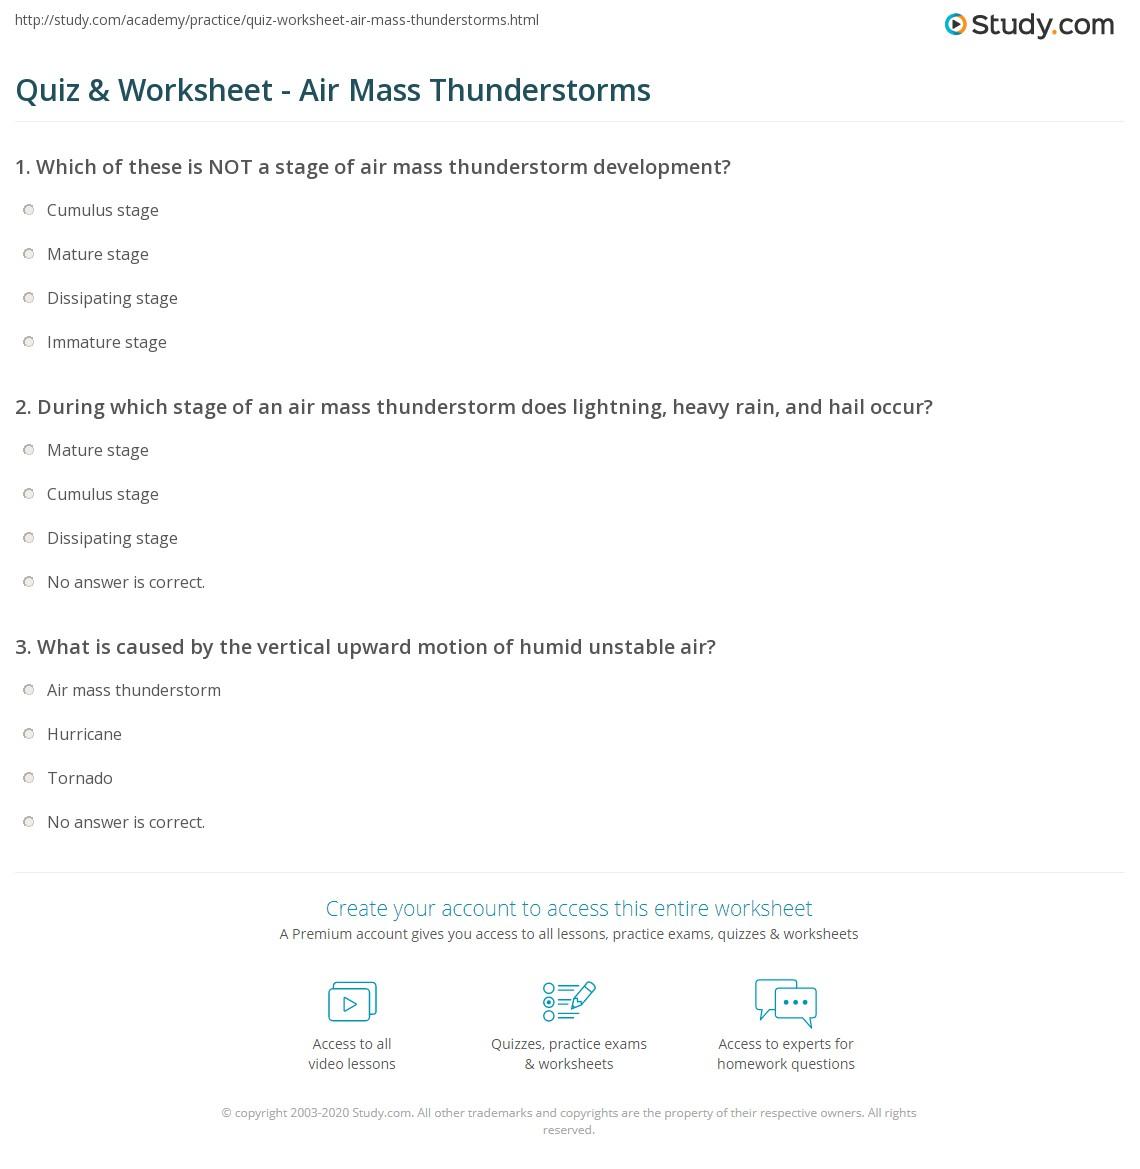 Quiz W Ksheet Ir M Ss Thunderst Ms Study